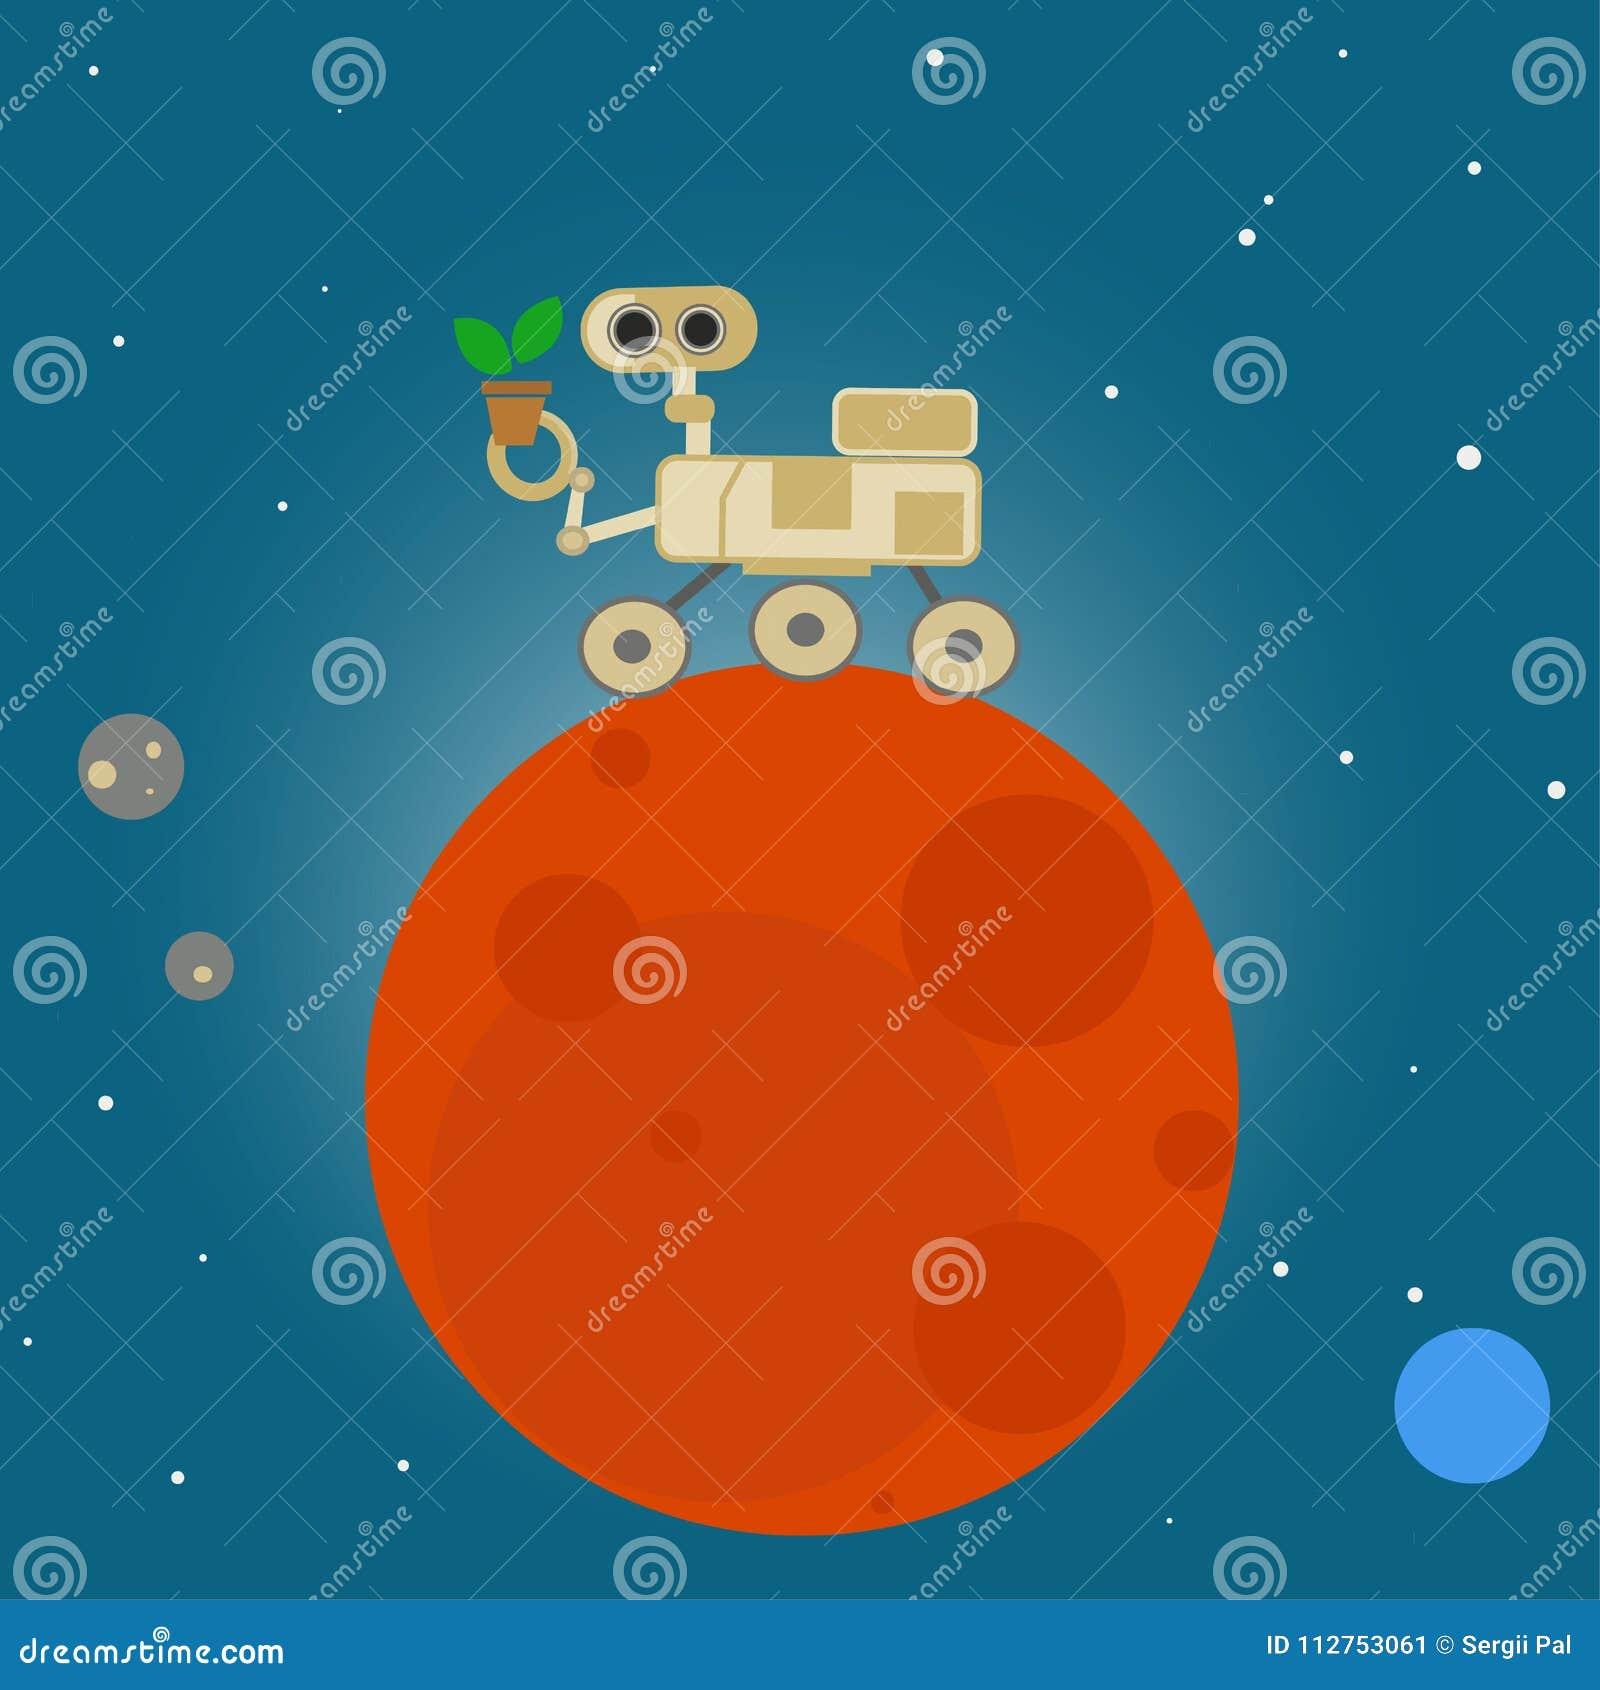 Rover On Mars In Cartoon Style Stock Vector - Illustration of